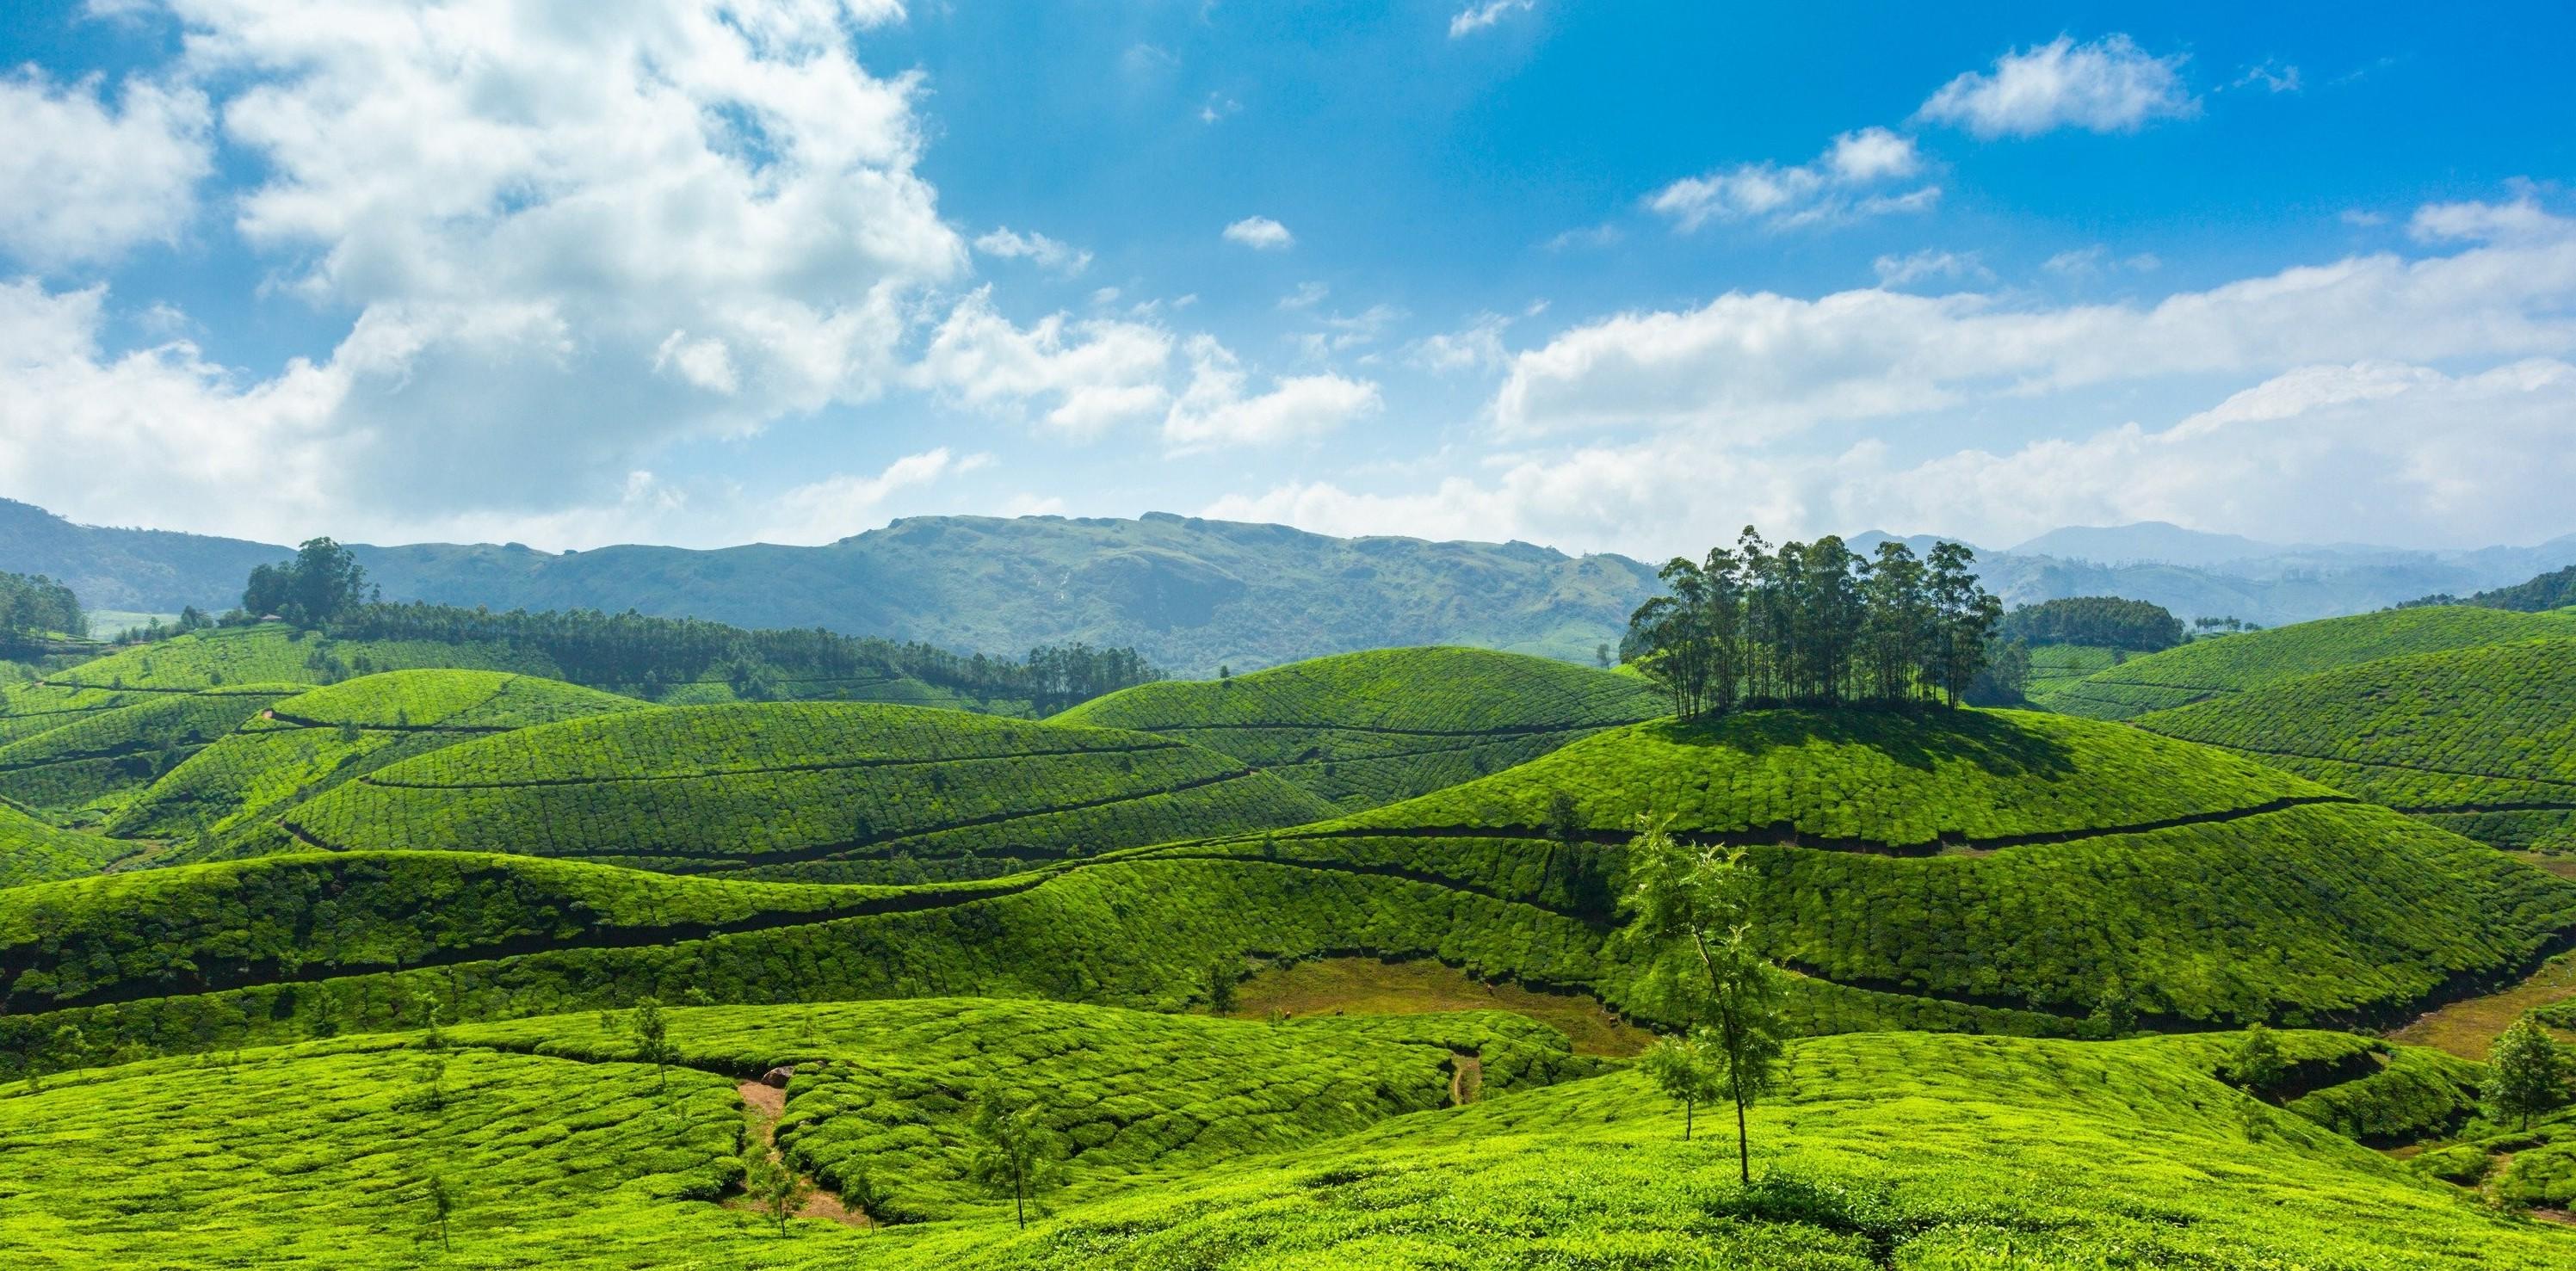 munnar-tea-plantations-kerala